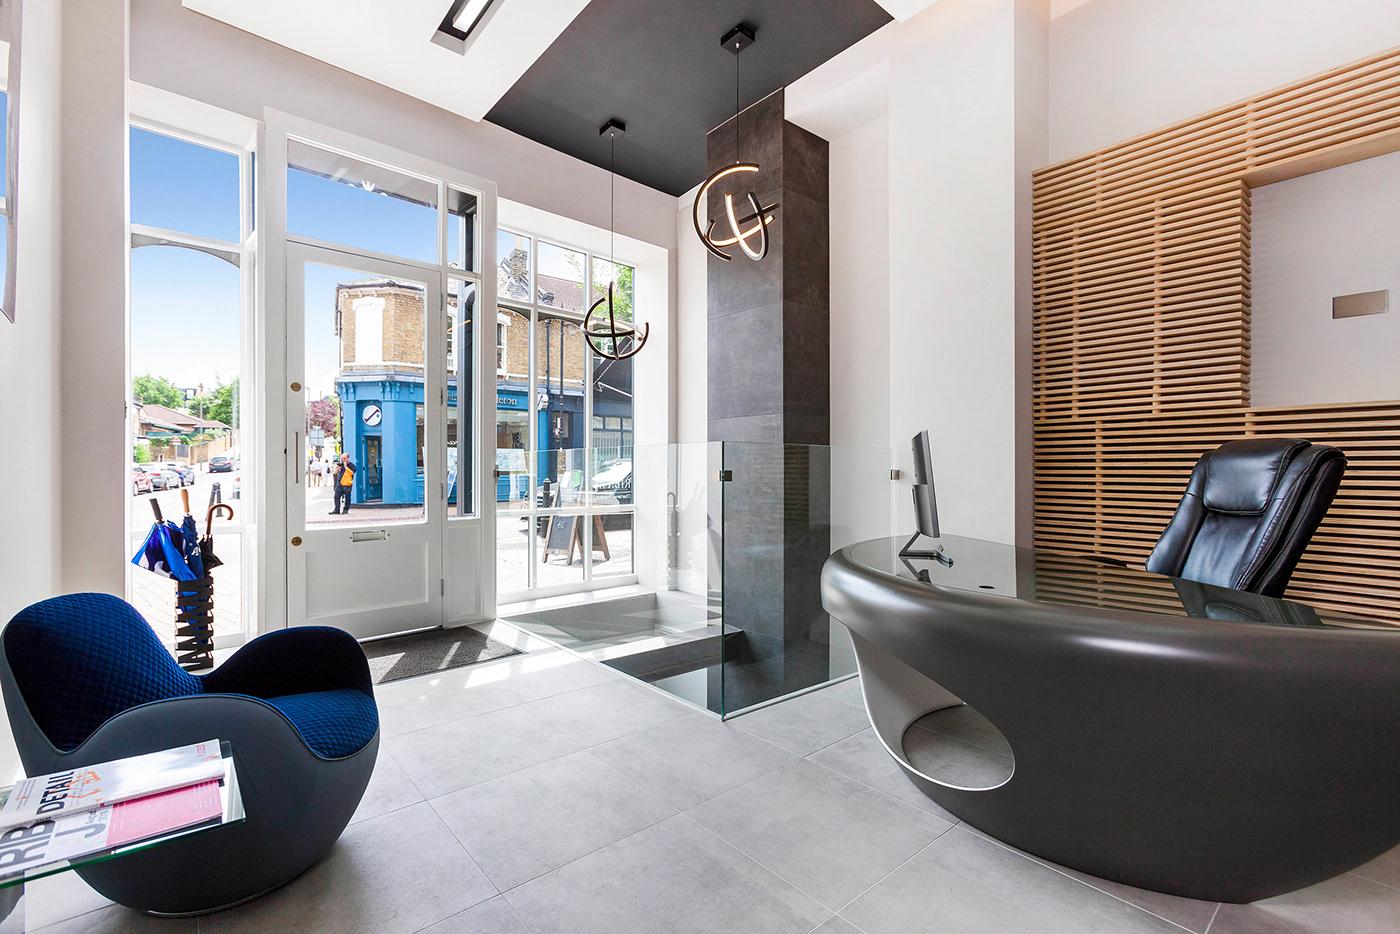 Image may contain: indoor, bathroom and window